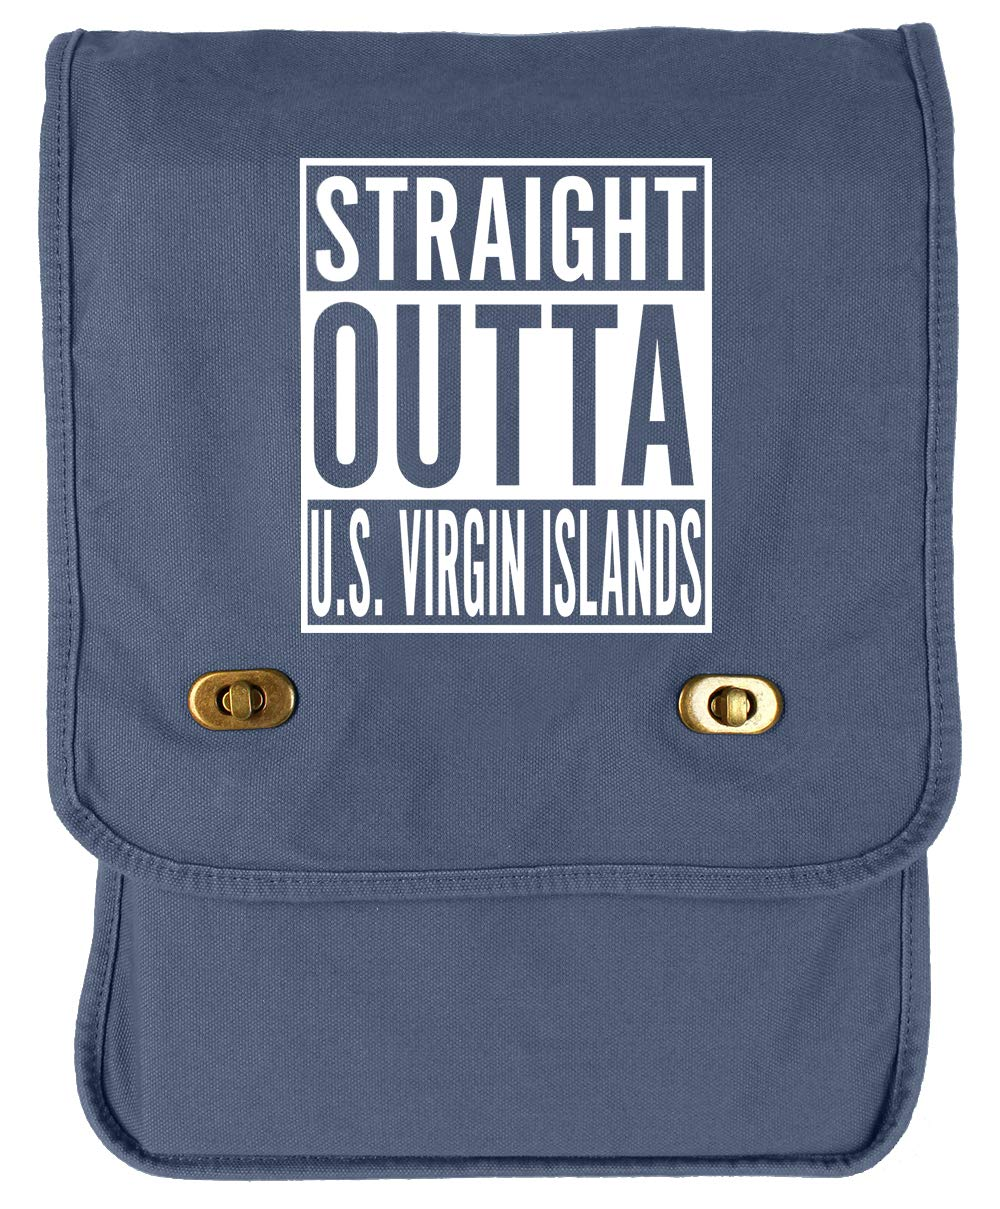 Tenacitee Straight Outta U.S Virgin Islands Red Brushed Canvas Messenger Bag